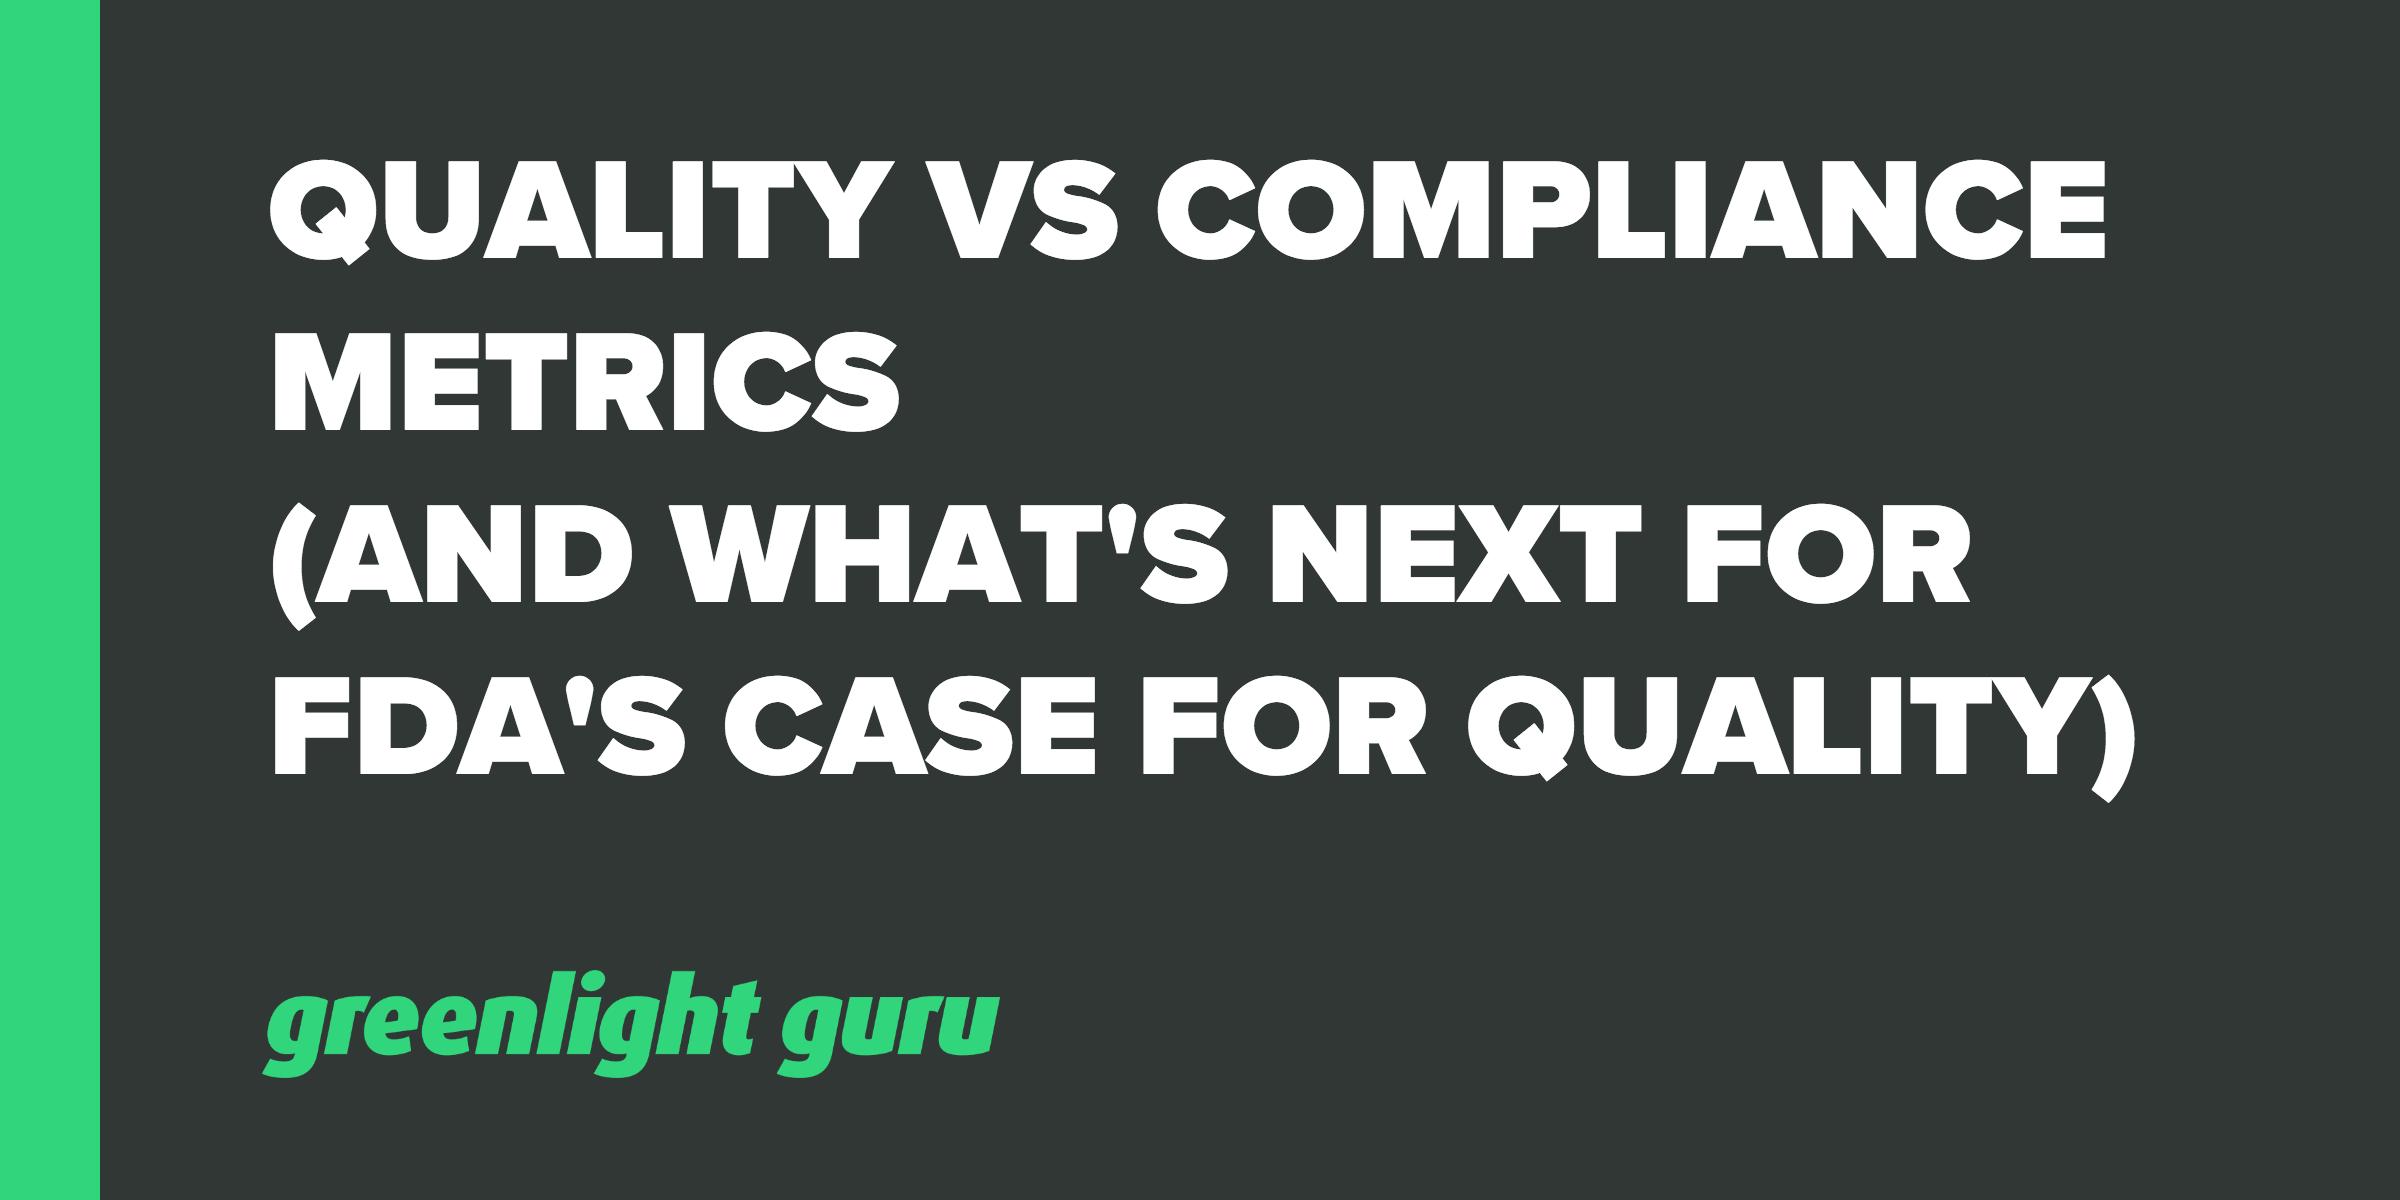 Quality vs. Compliance Metrics